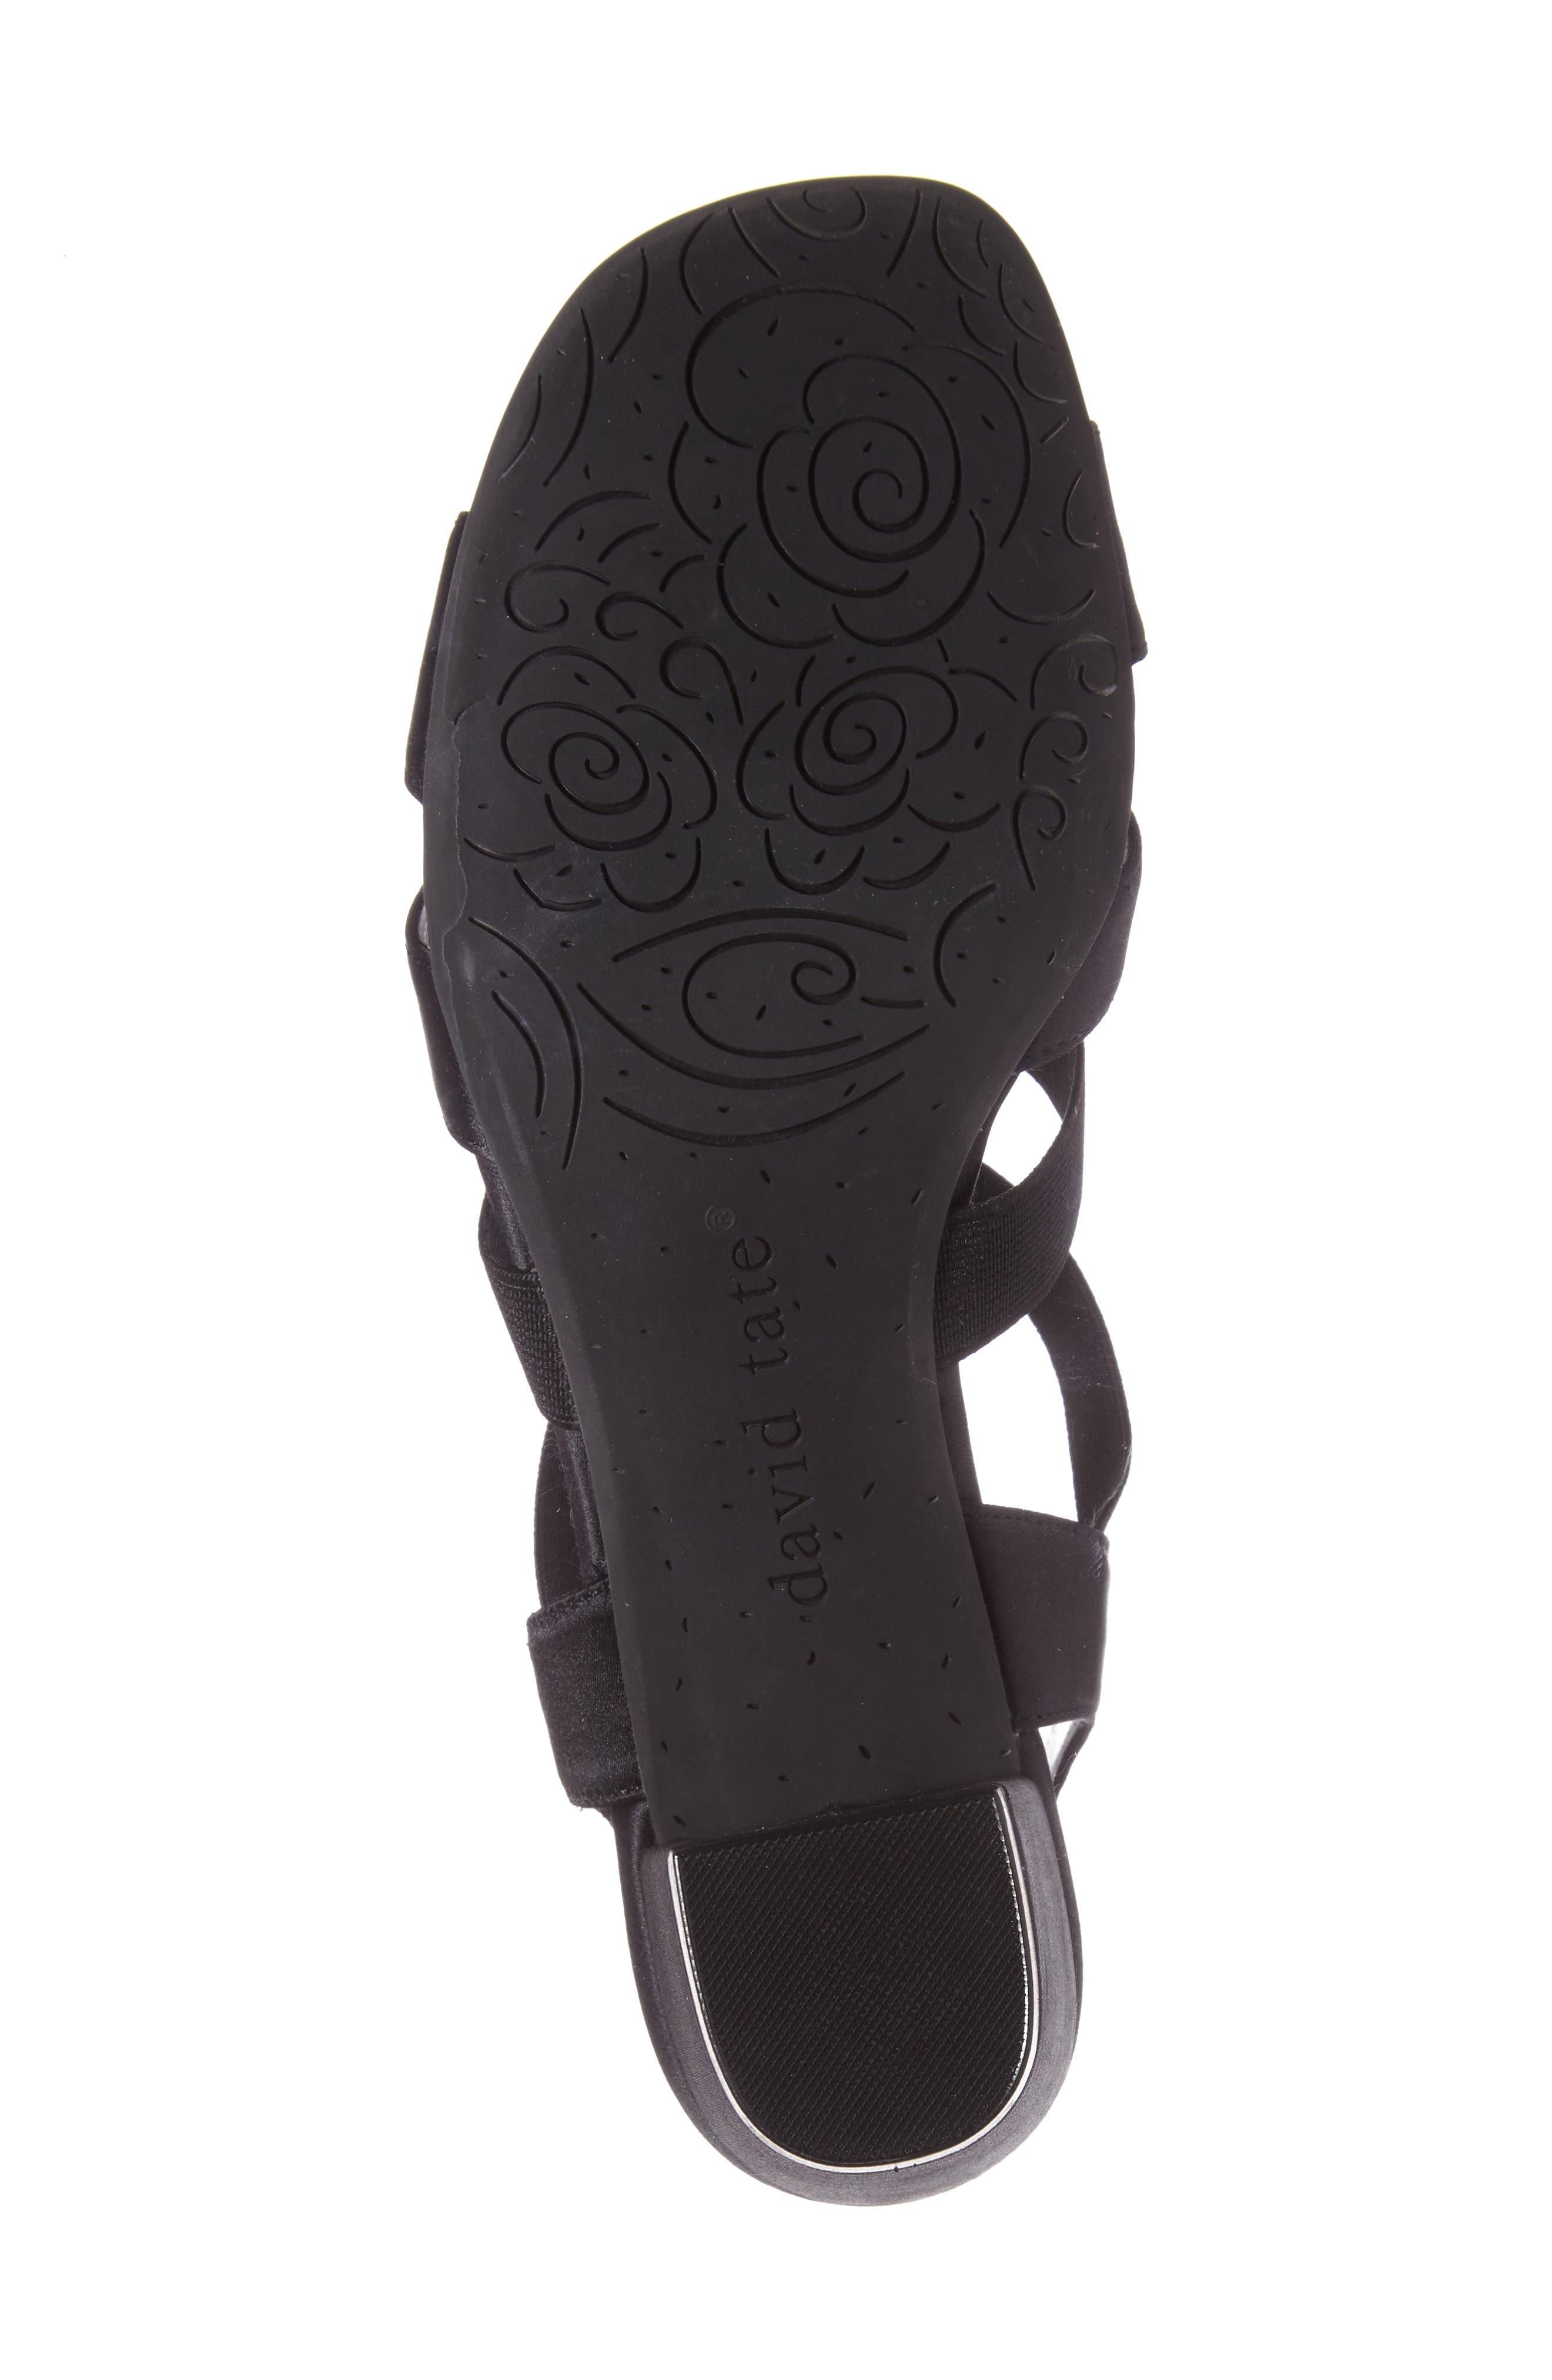 DAVID TATE, Eve Embellished Sandal, Alternate thumbnail 4, color, BLACK FABRIC